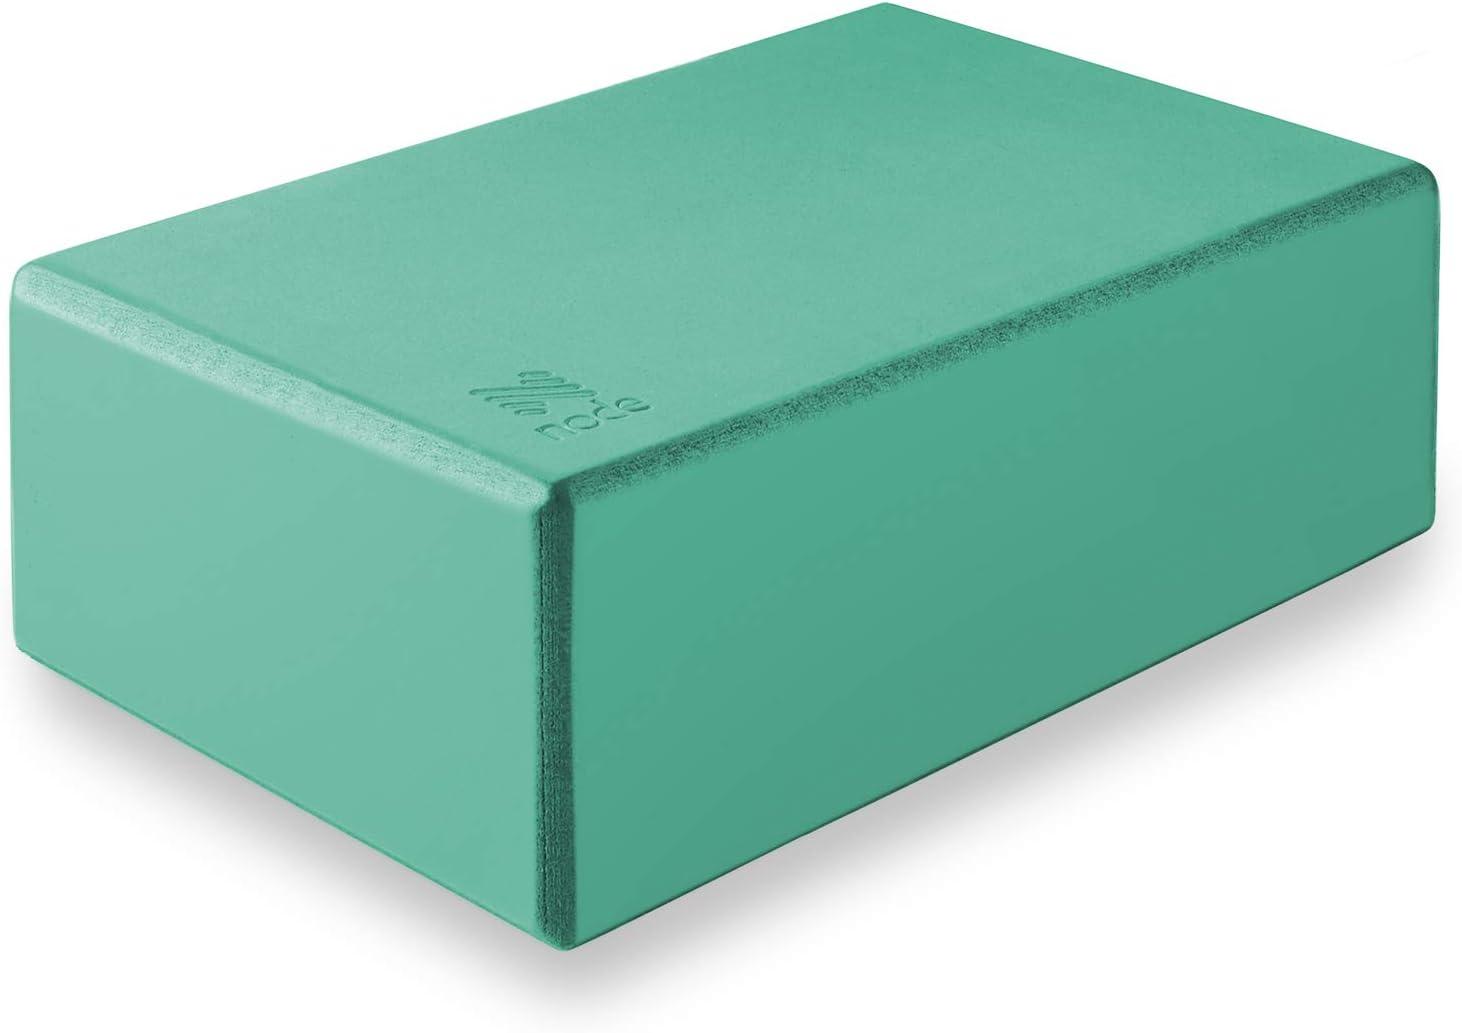 Set of 2 Node Fitness Premium Yoga Block 3 Inch Thick EVA Foam Brick